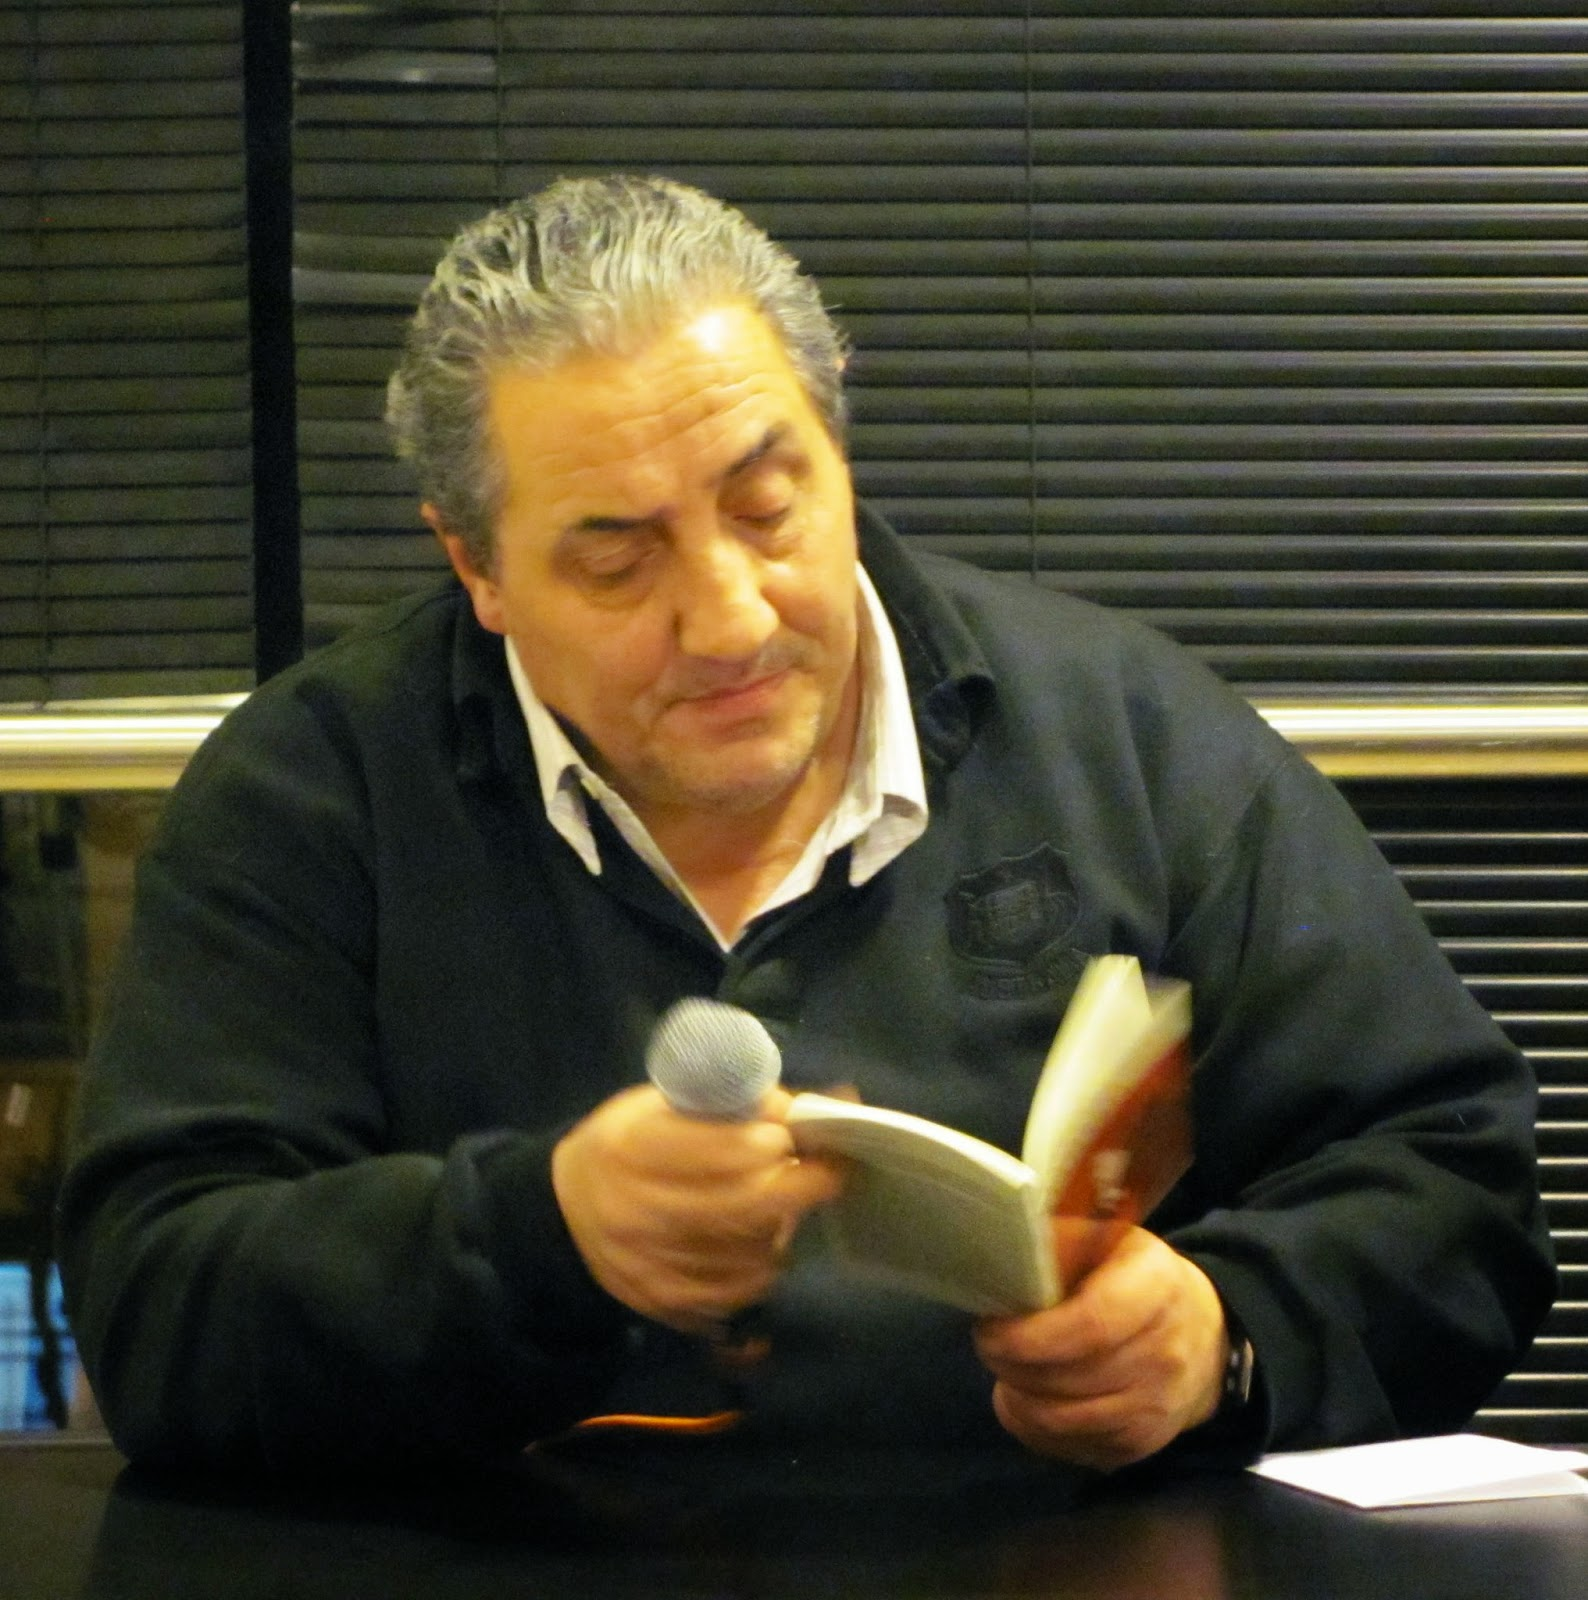 Raúl Pérez Arias